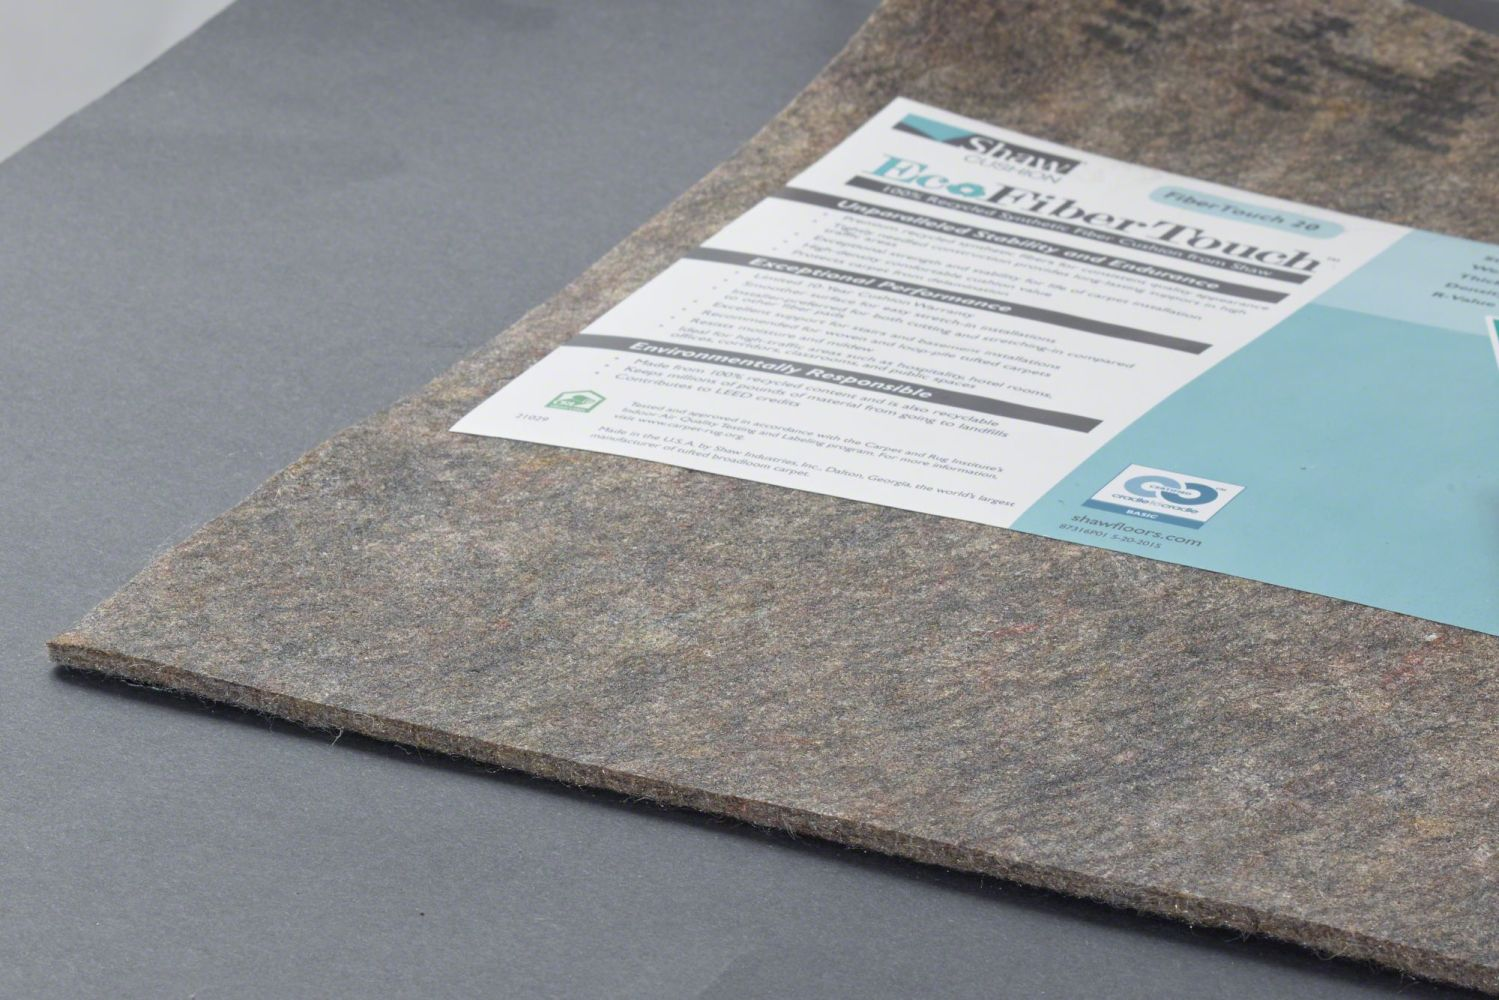 Shaw Floors Eco Edge Cushion Fibertouch 20-12 Grey 00001_203FT